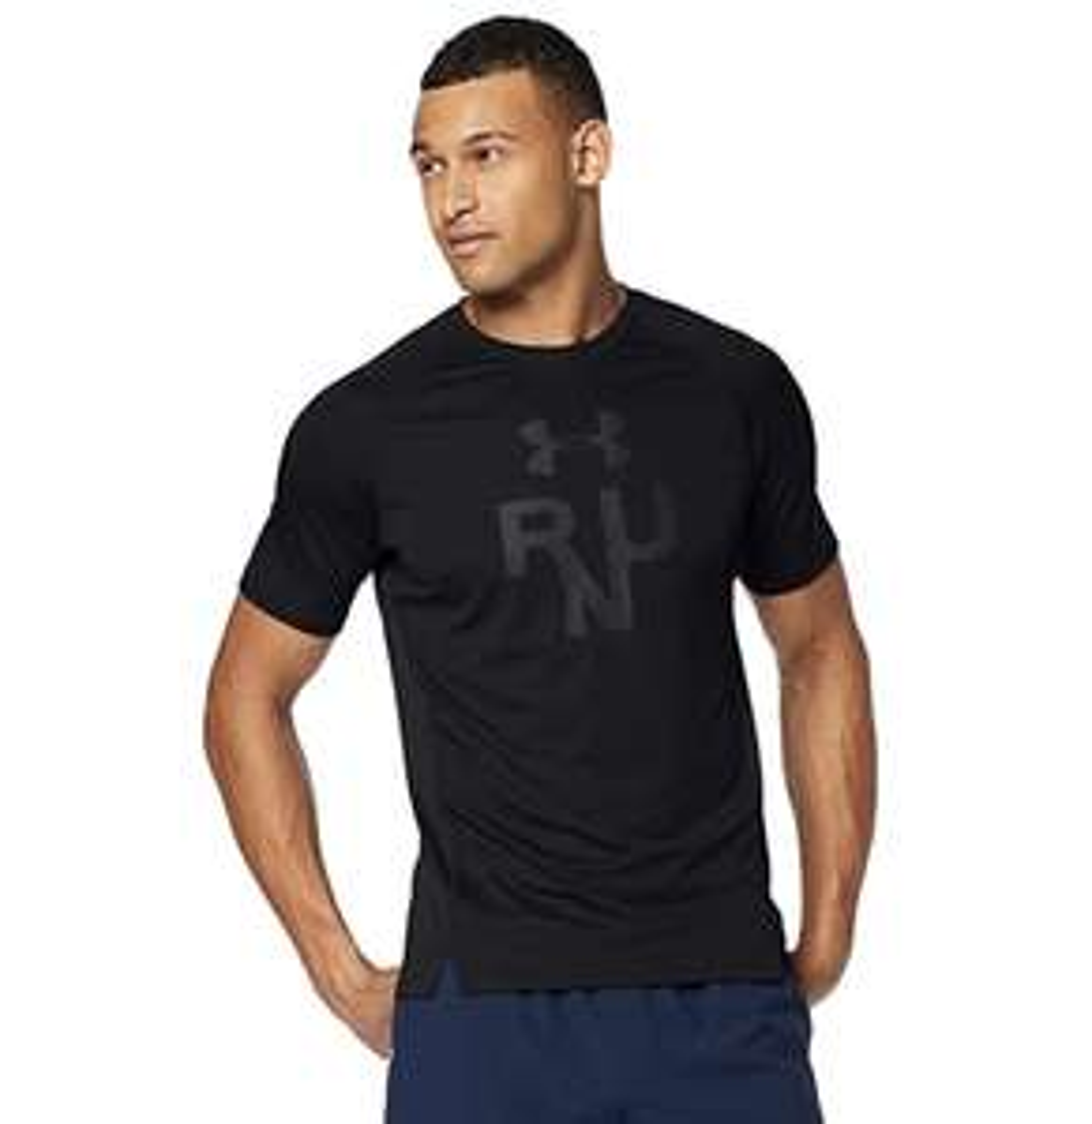 Under Armour Men's Qualifier Glare Short-Sleeve Shirt - Black XL - £8.82 - (+£4.49 Non-Prime) @ Amazon